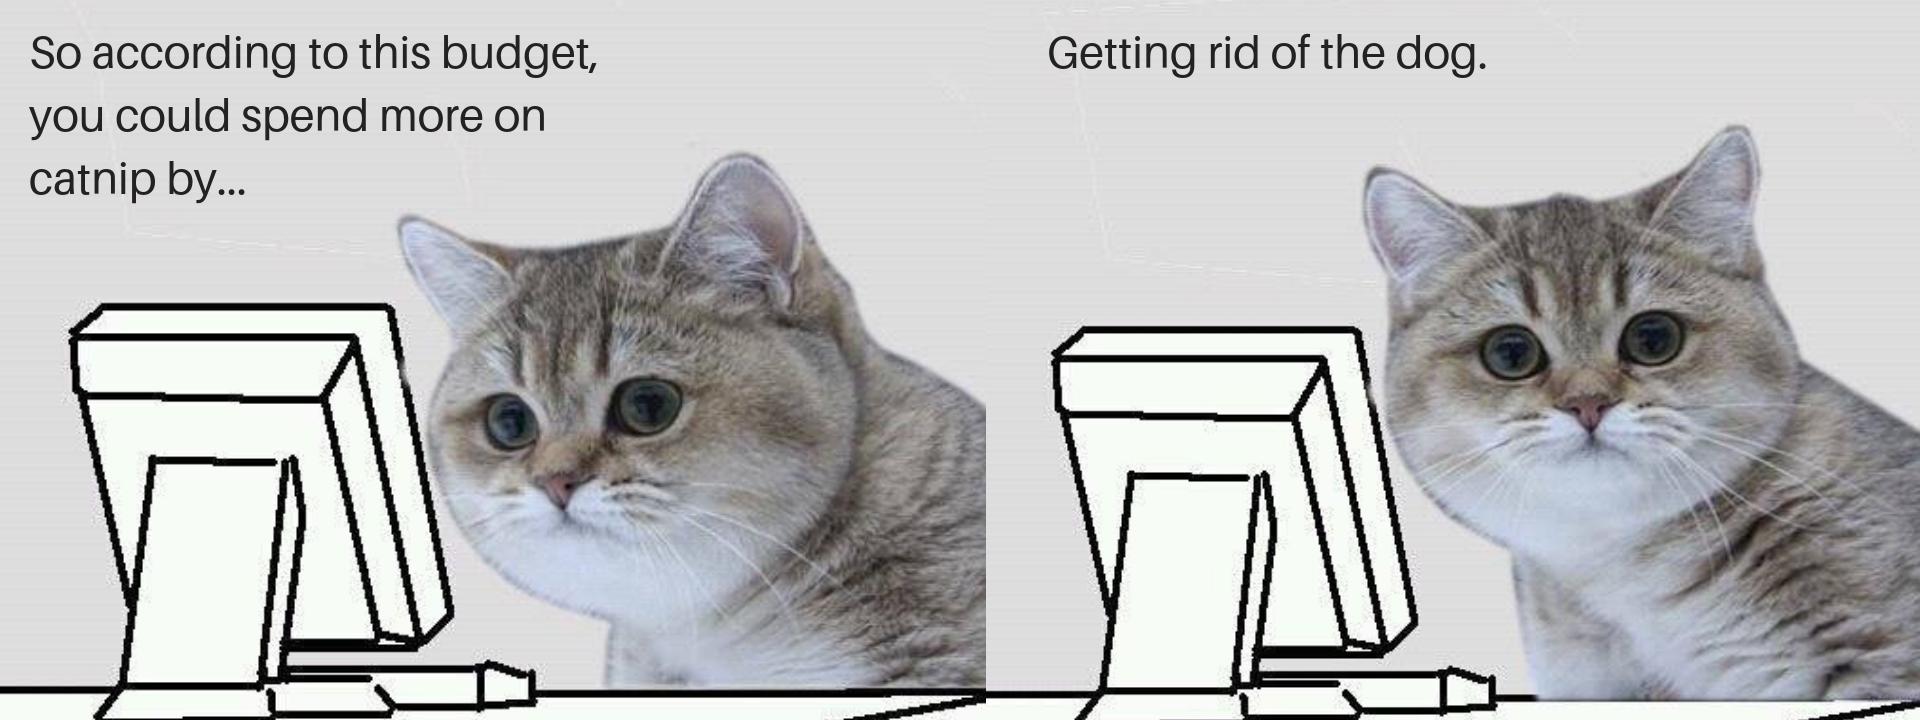 cat budget meme